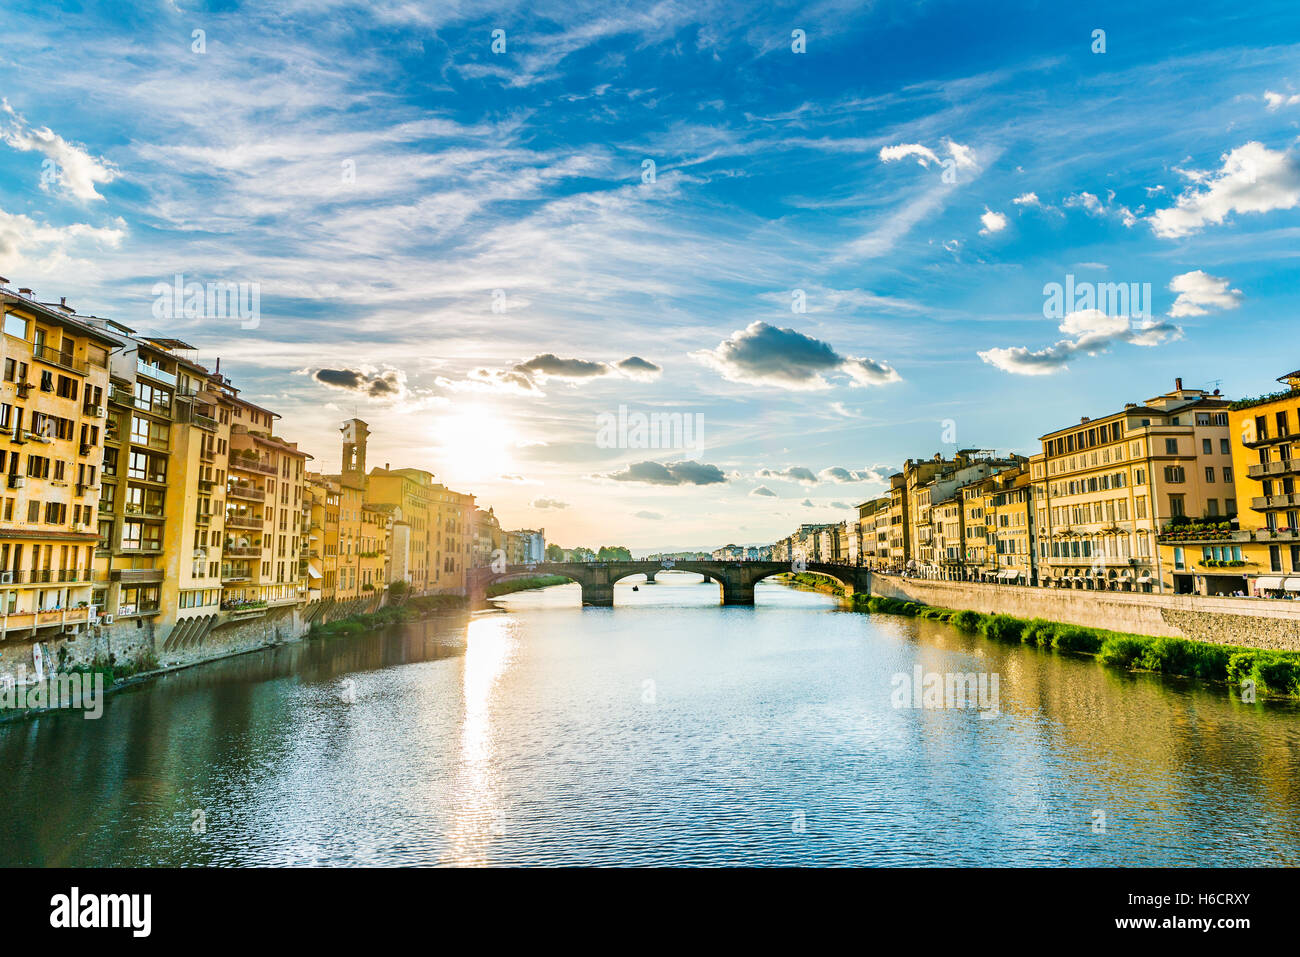 View of Ponte Santa Trinita bridge from Ponte Vecchio over Arno River, Florence, Tuscany, Italy - Stock Image